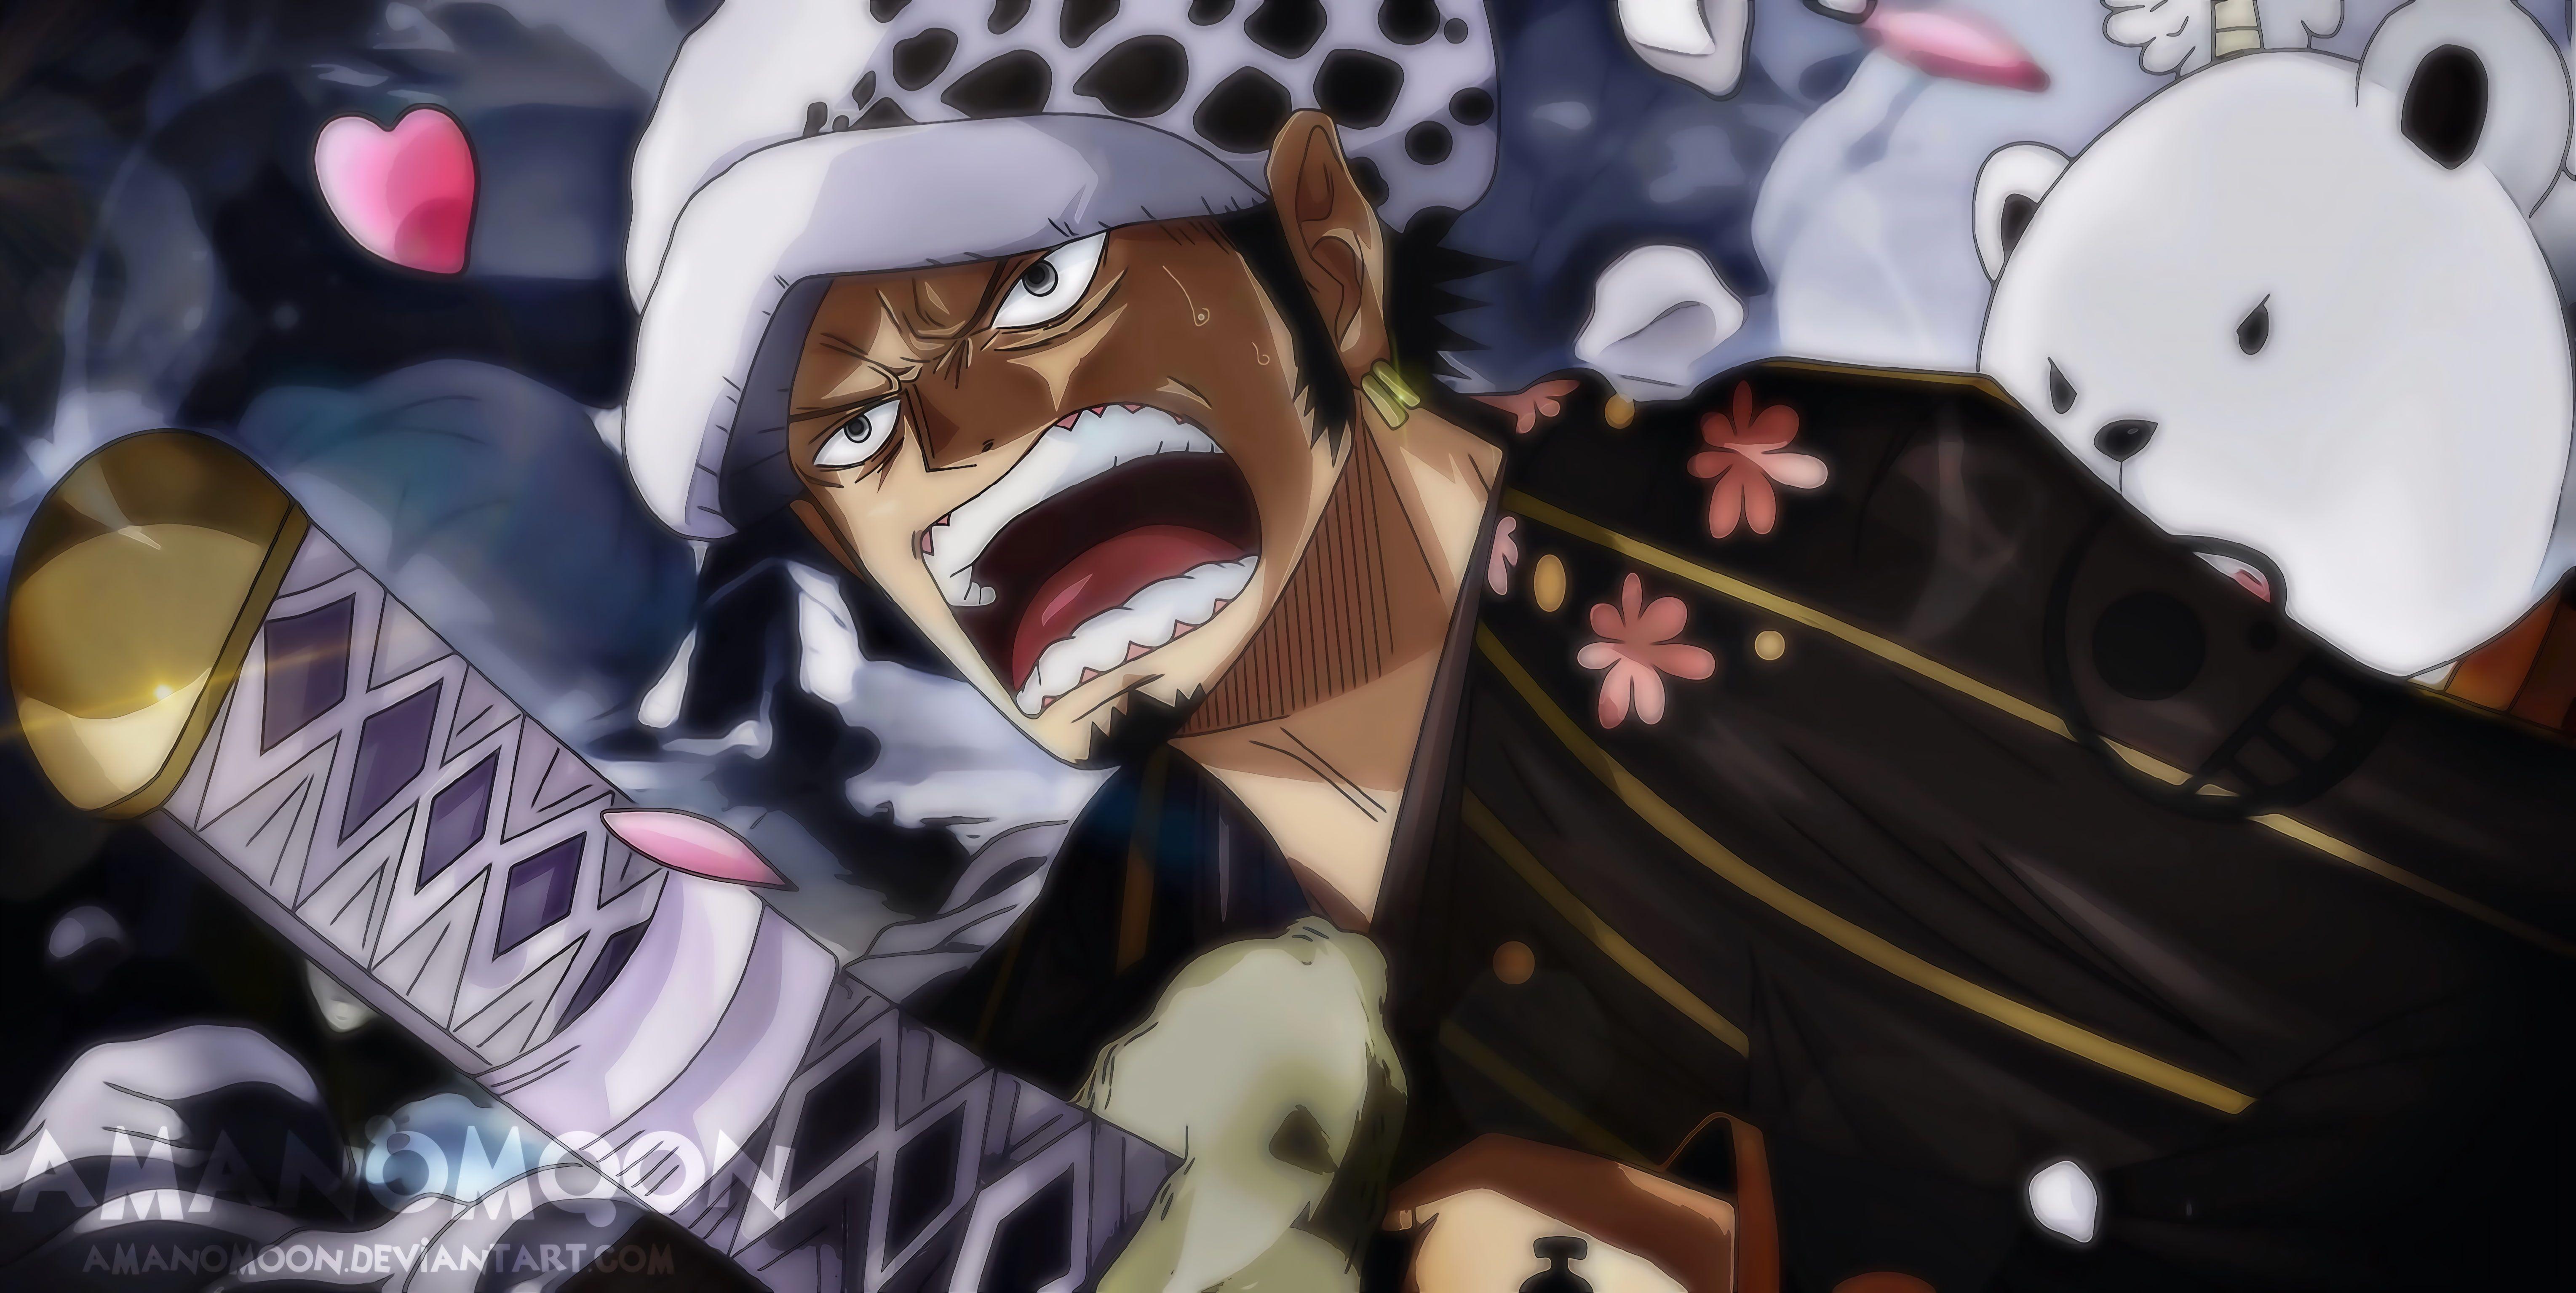 One Piece One Piece Cap 914 Trafalgar Law Amanomoon 5k Wallpaper Hdwallpaper Desktop In 2020 Trafalgar Law One Piece Anime Trafalgar Law Wallpapers